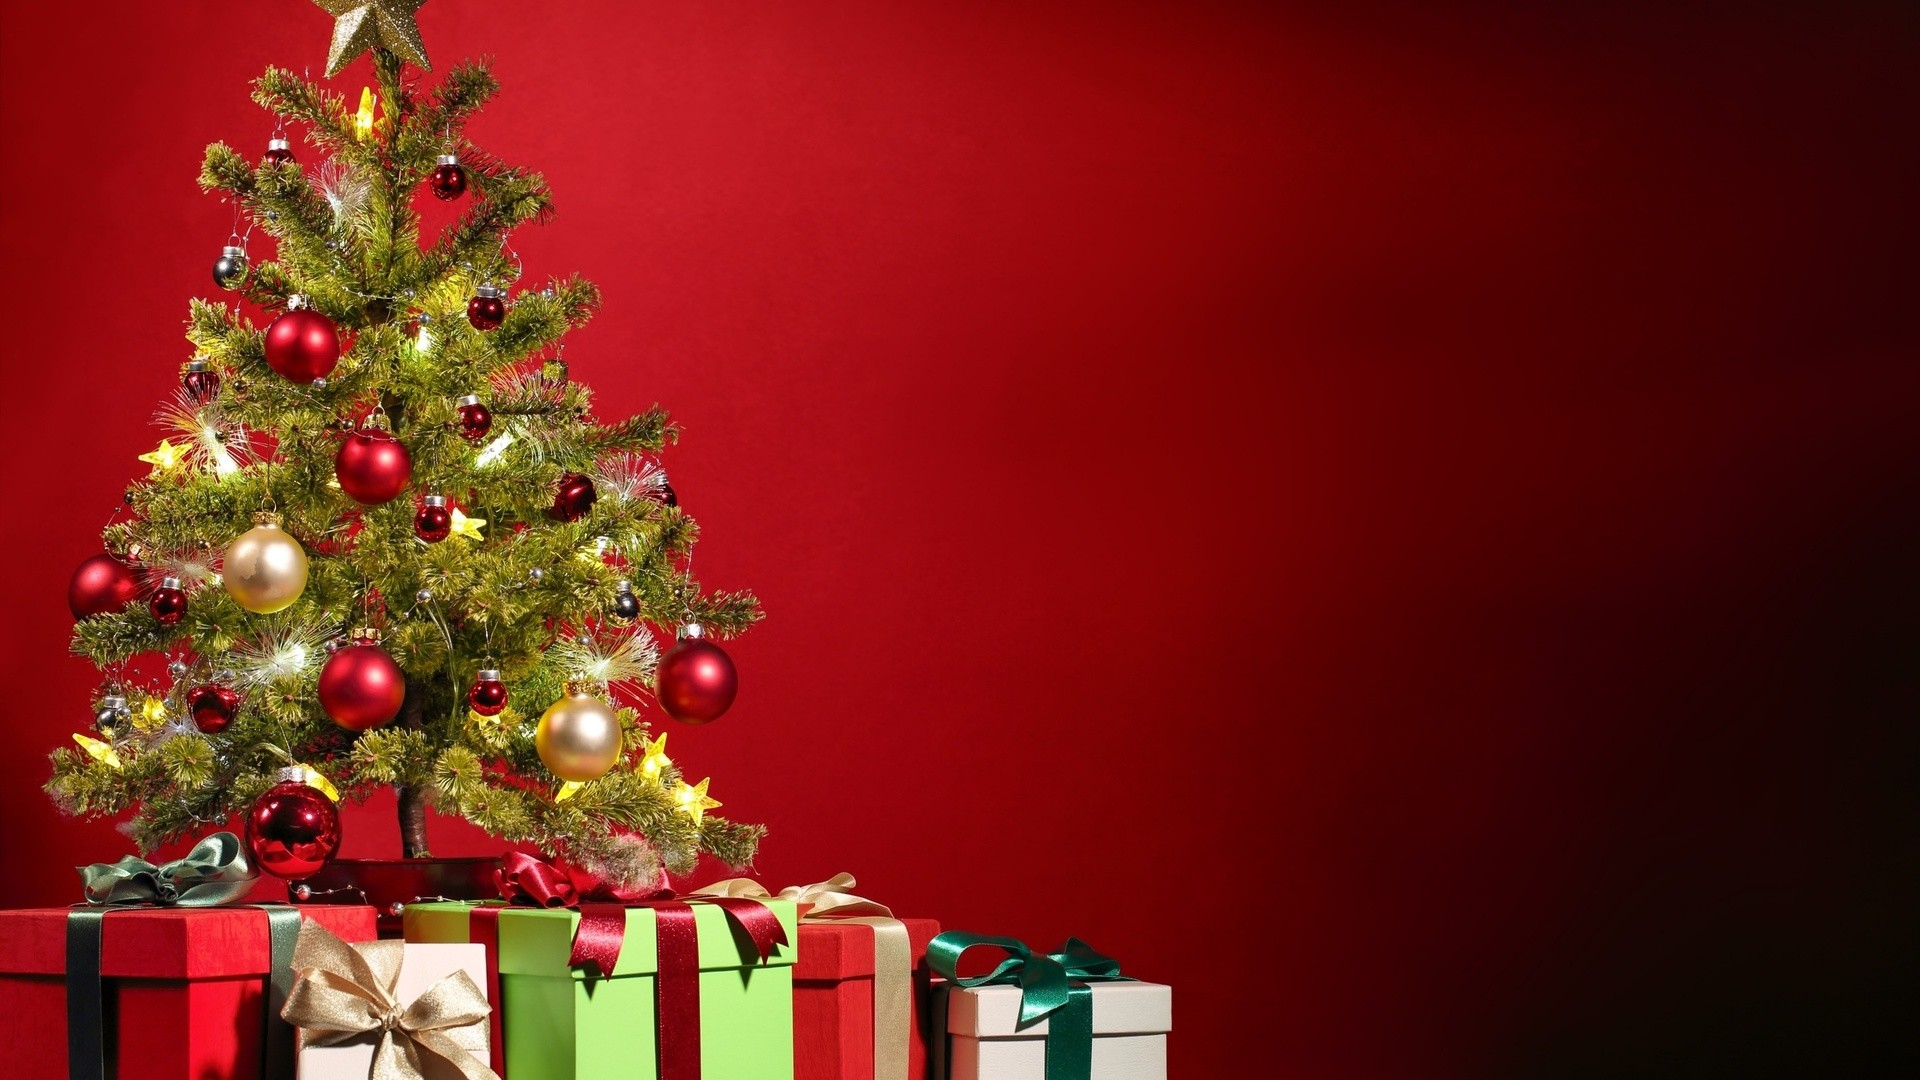 Christmas Desktop background